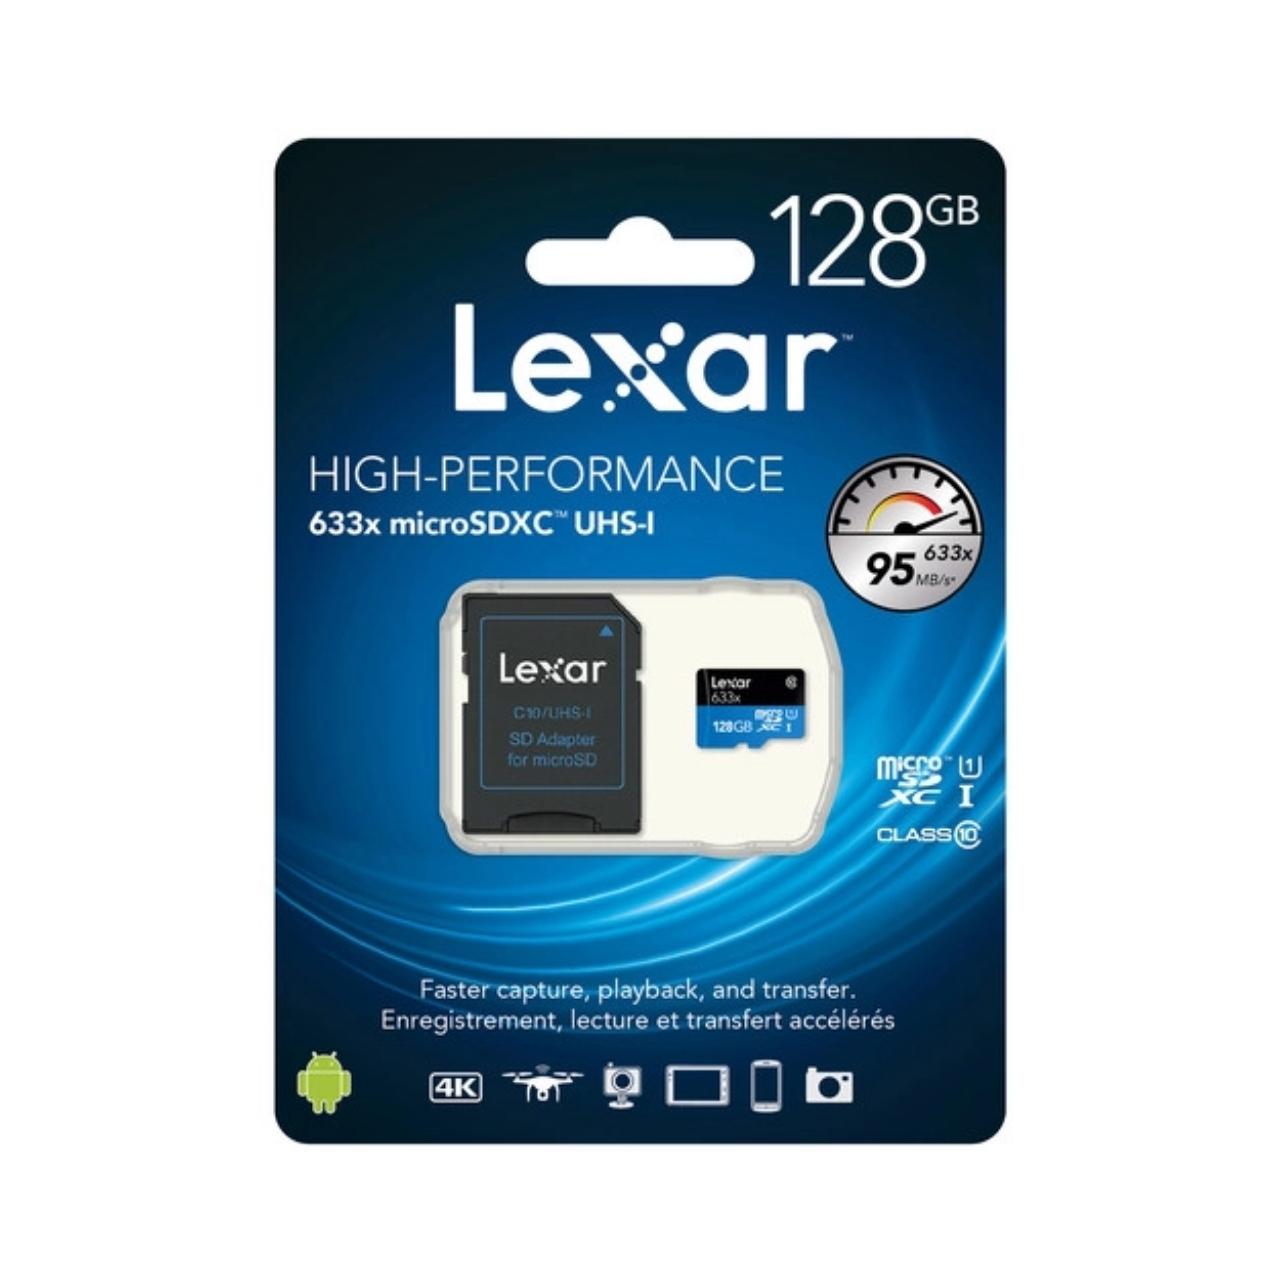 Lexar Tarjeta Memoria Micro SDXC 128Gb  Profesional 95Mb/s, UHS-I, U3, V30